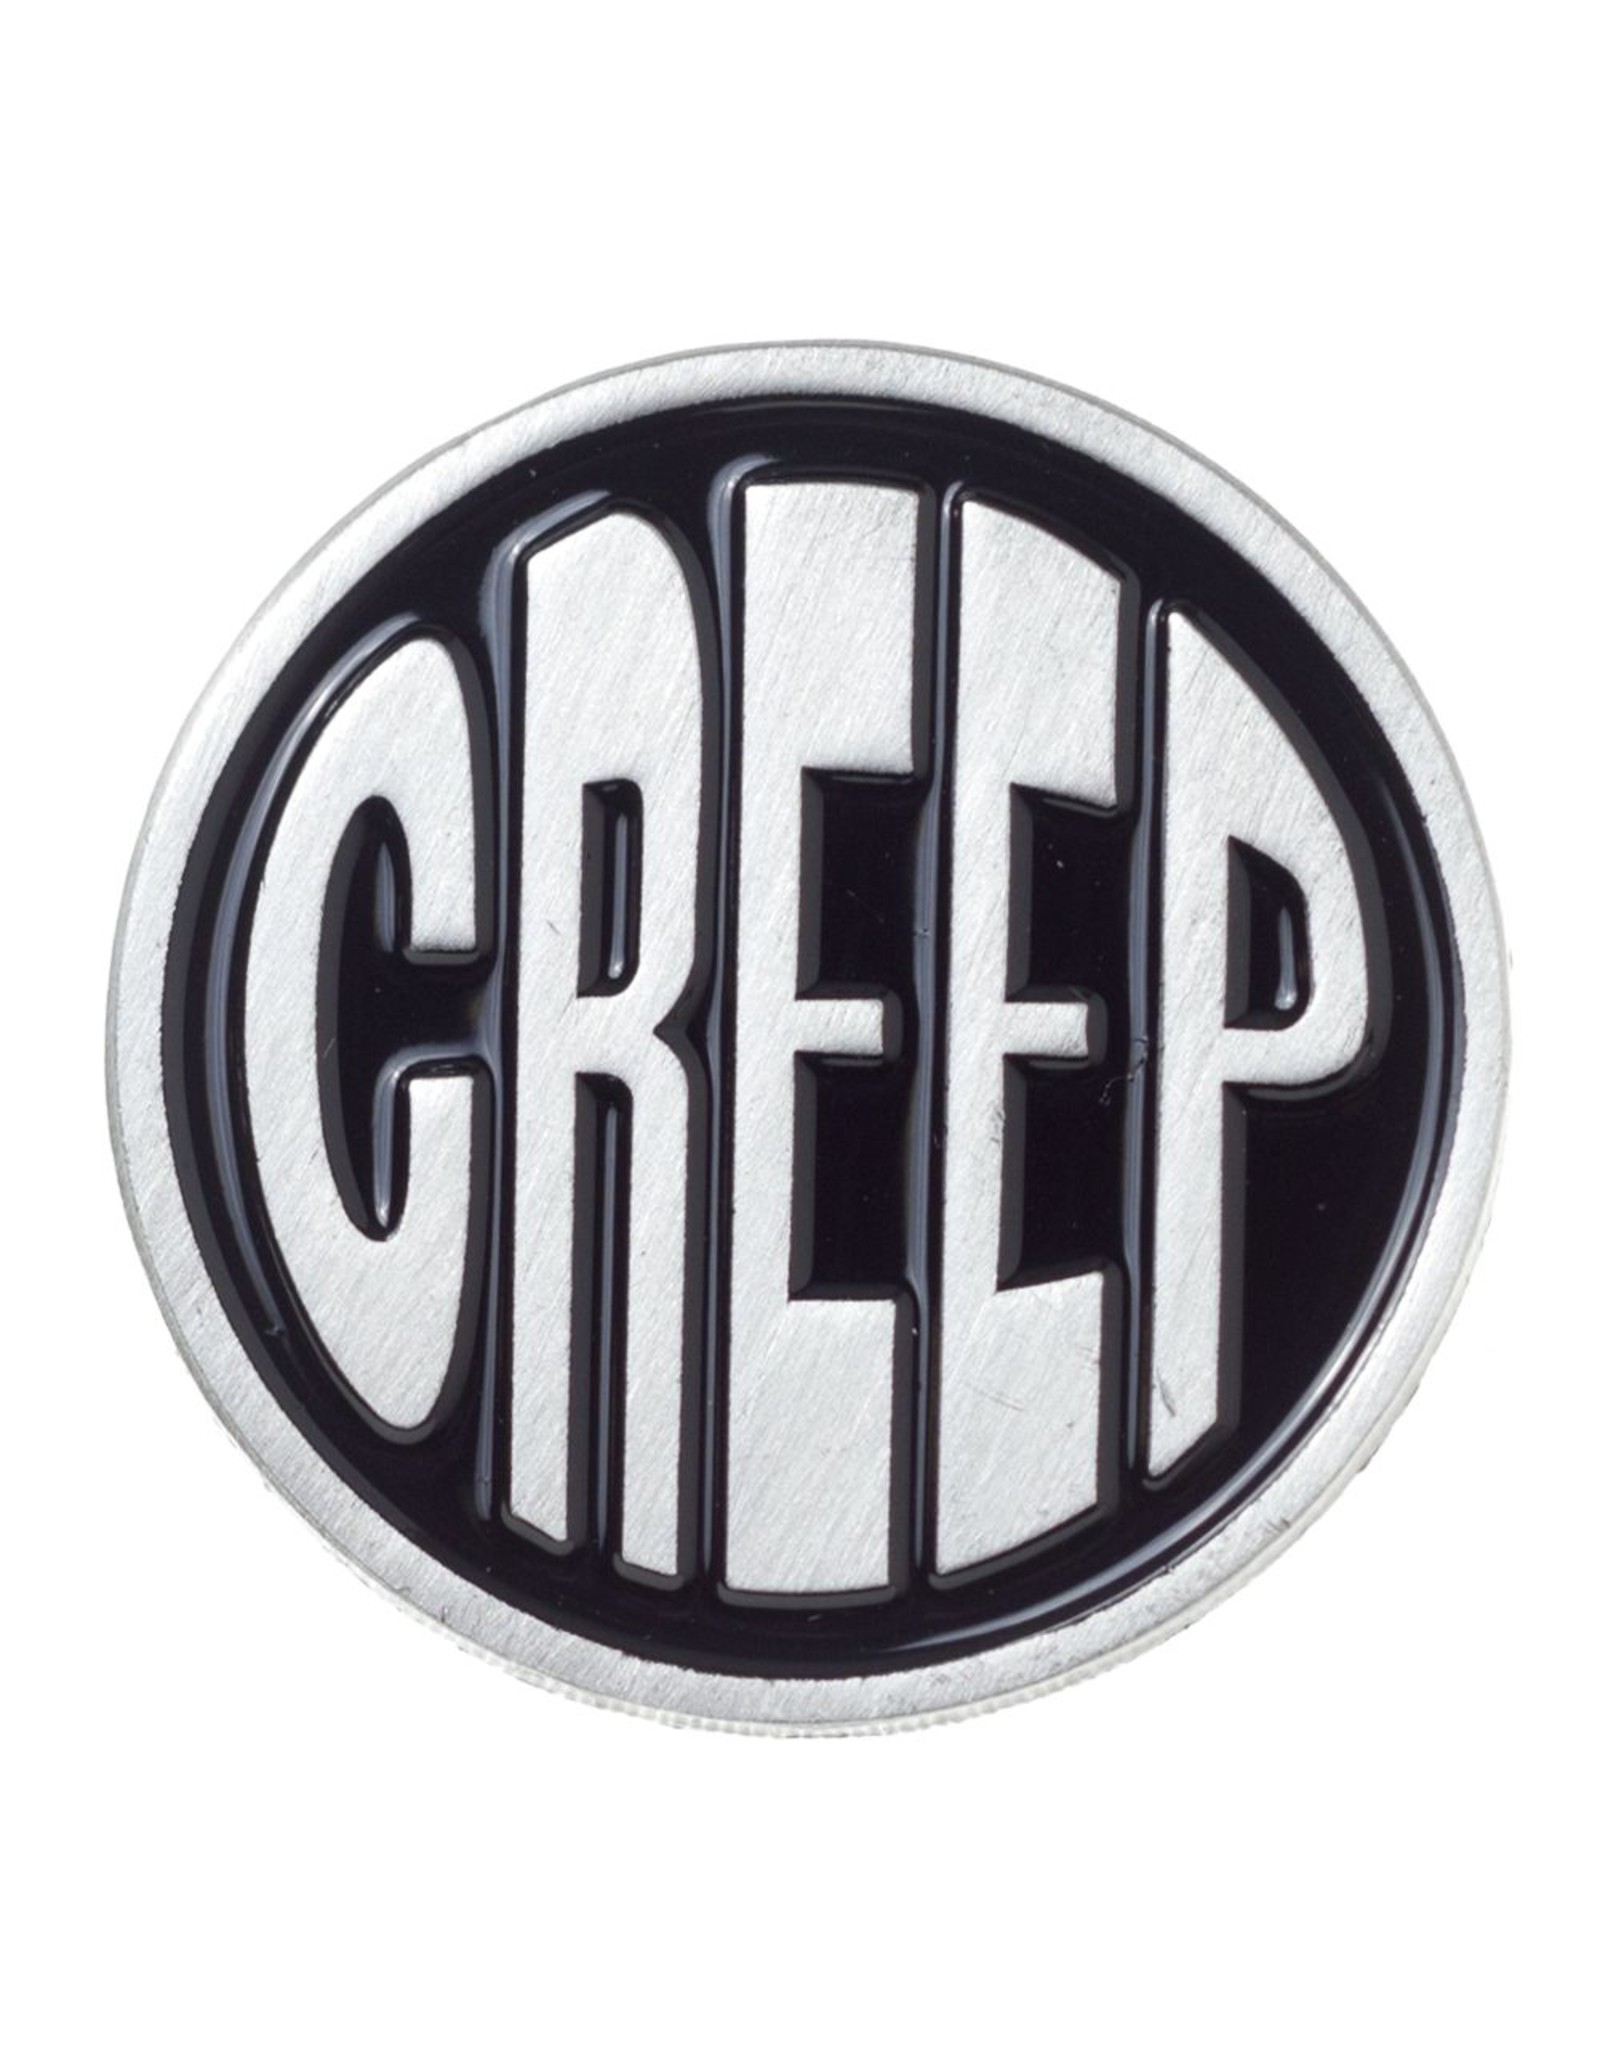 SOURPUSS - Creep Pin